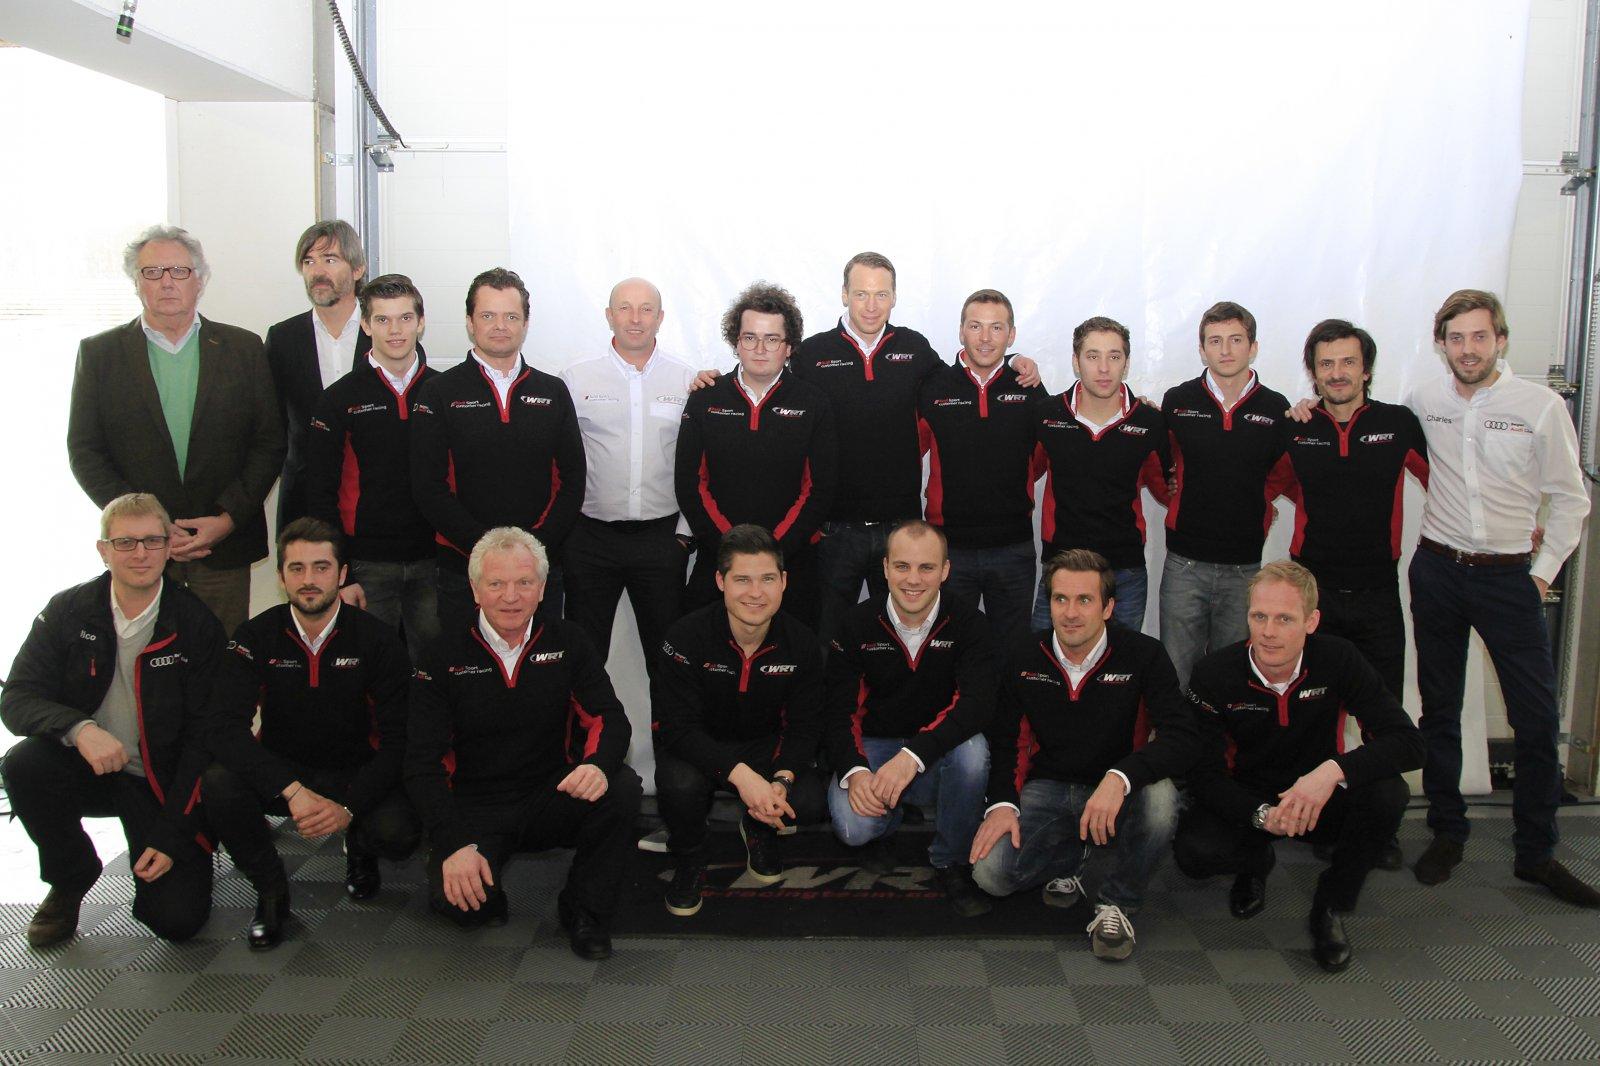 Belgian Audi Club Team WRT ready to defend their titles